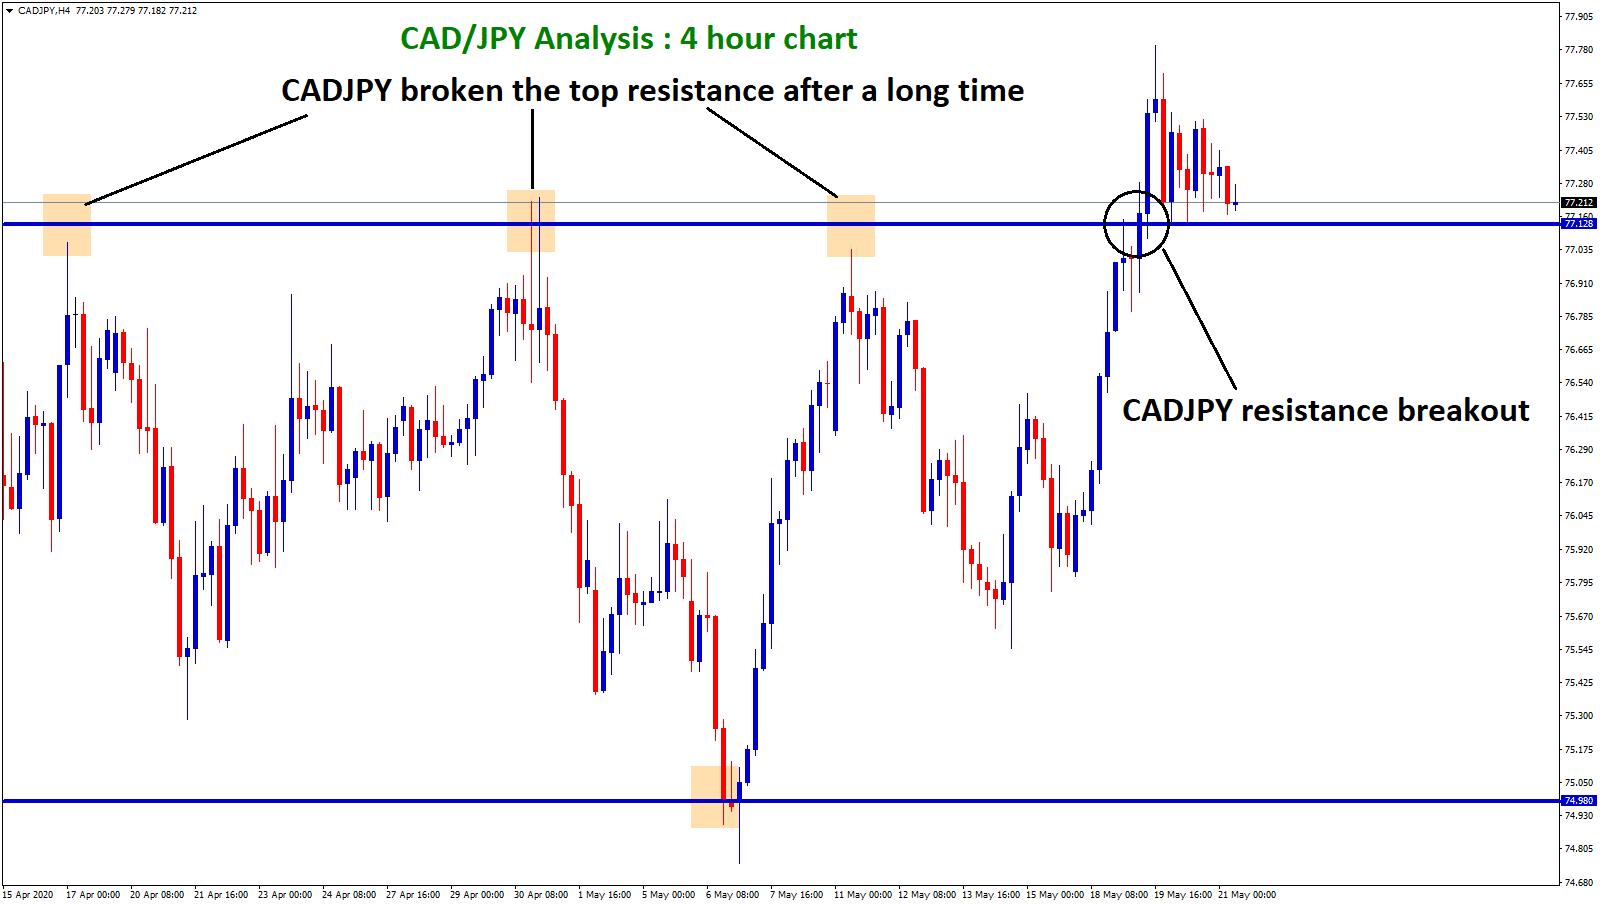 CADJPY broken the top resistance after long time